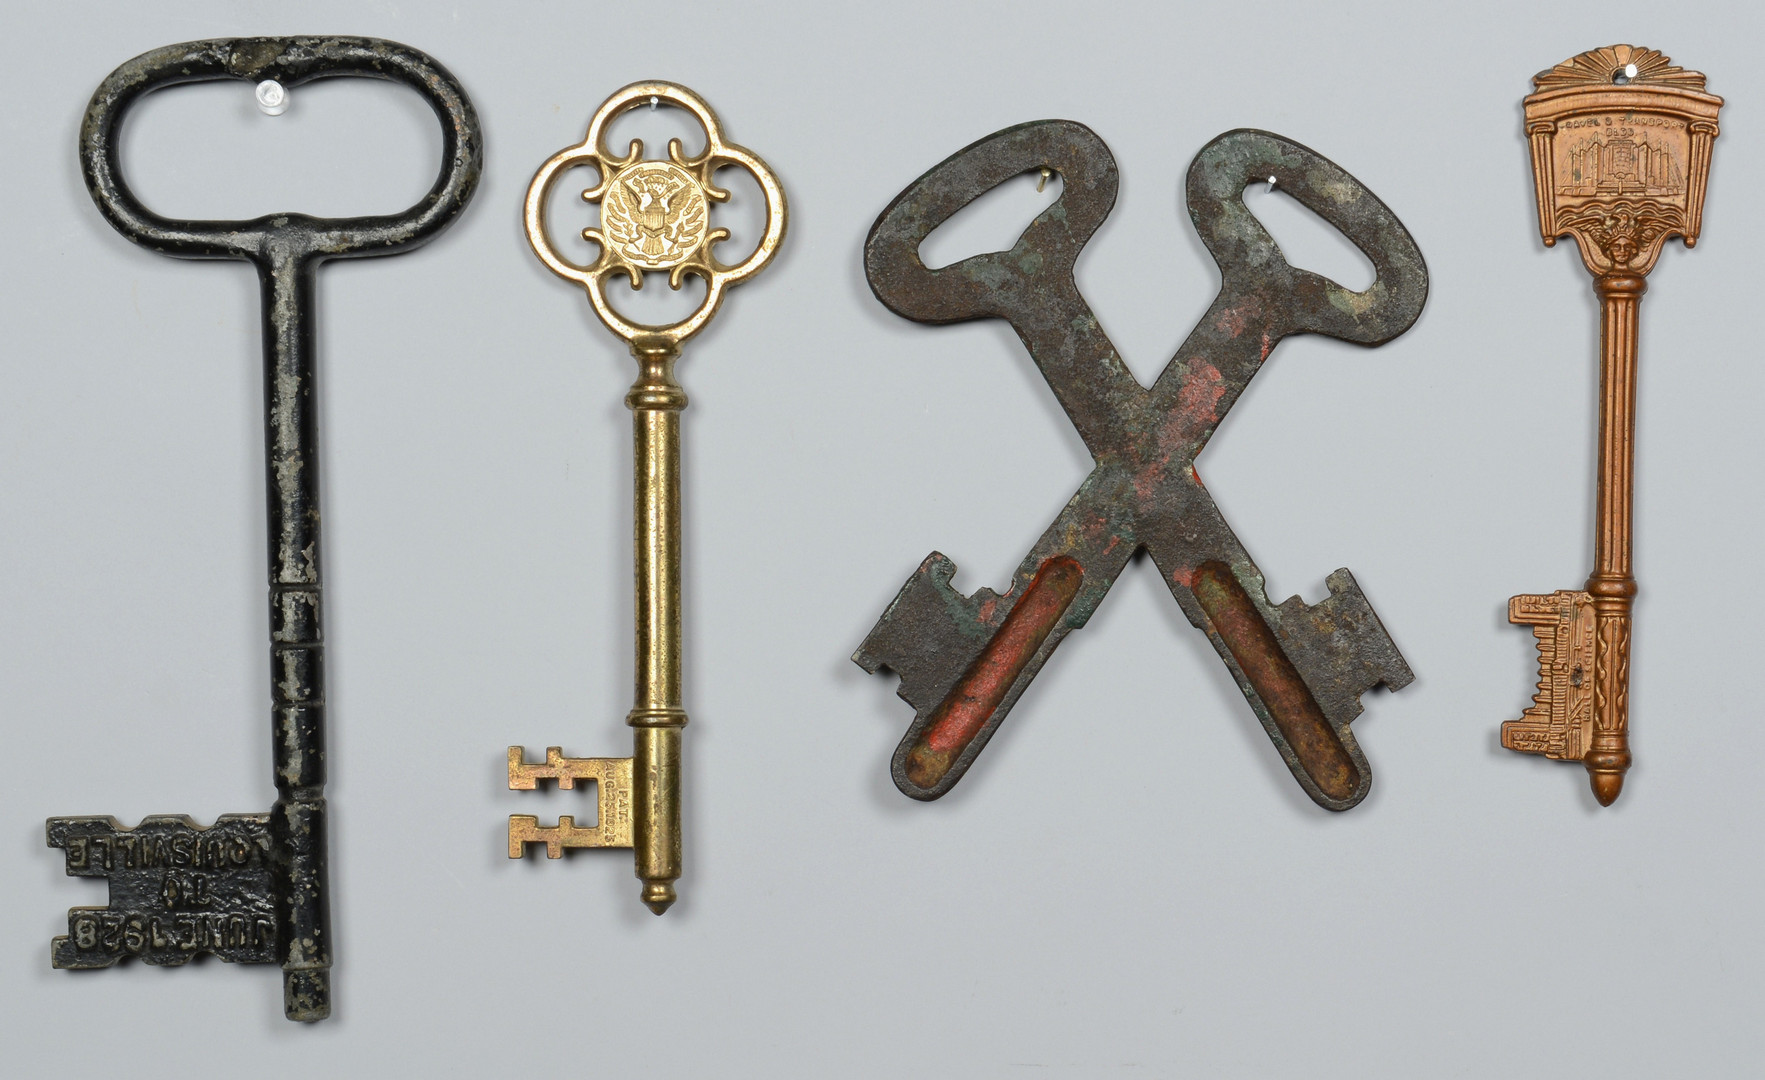 Lot 601: 6 Painted Metal Keys, incl. Signs